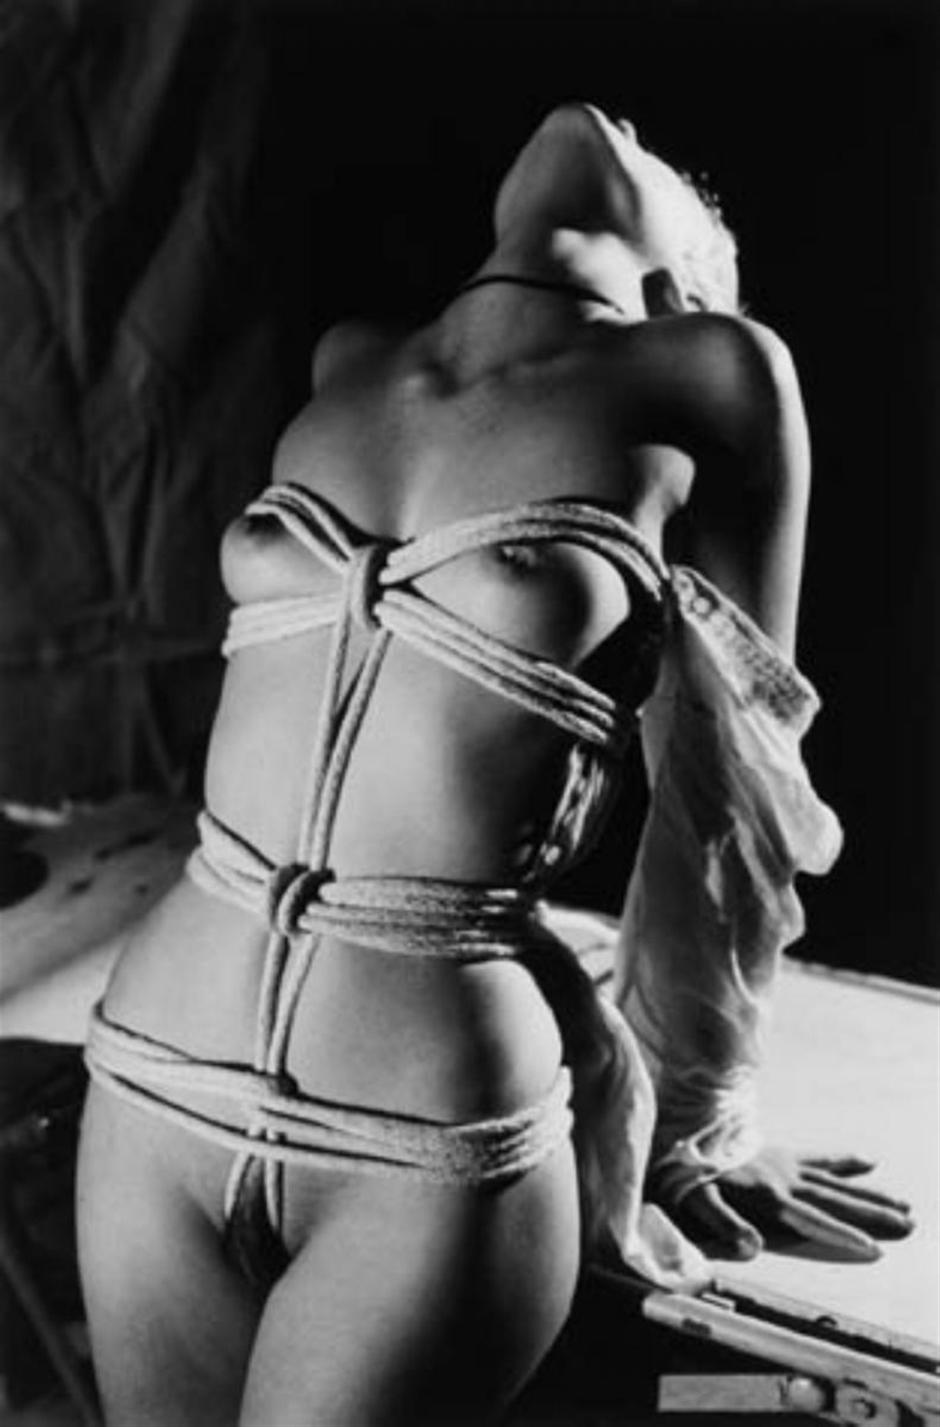 Lempertz-862-135-Photographie--Photoarbeiten-Richard-Kern-Erin